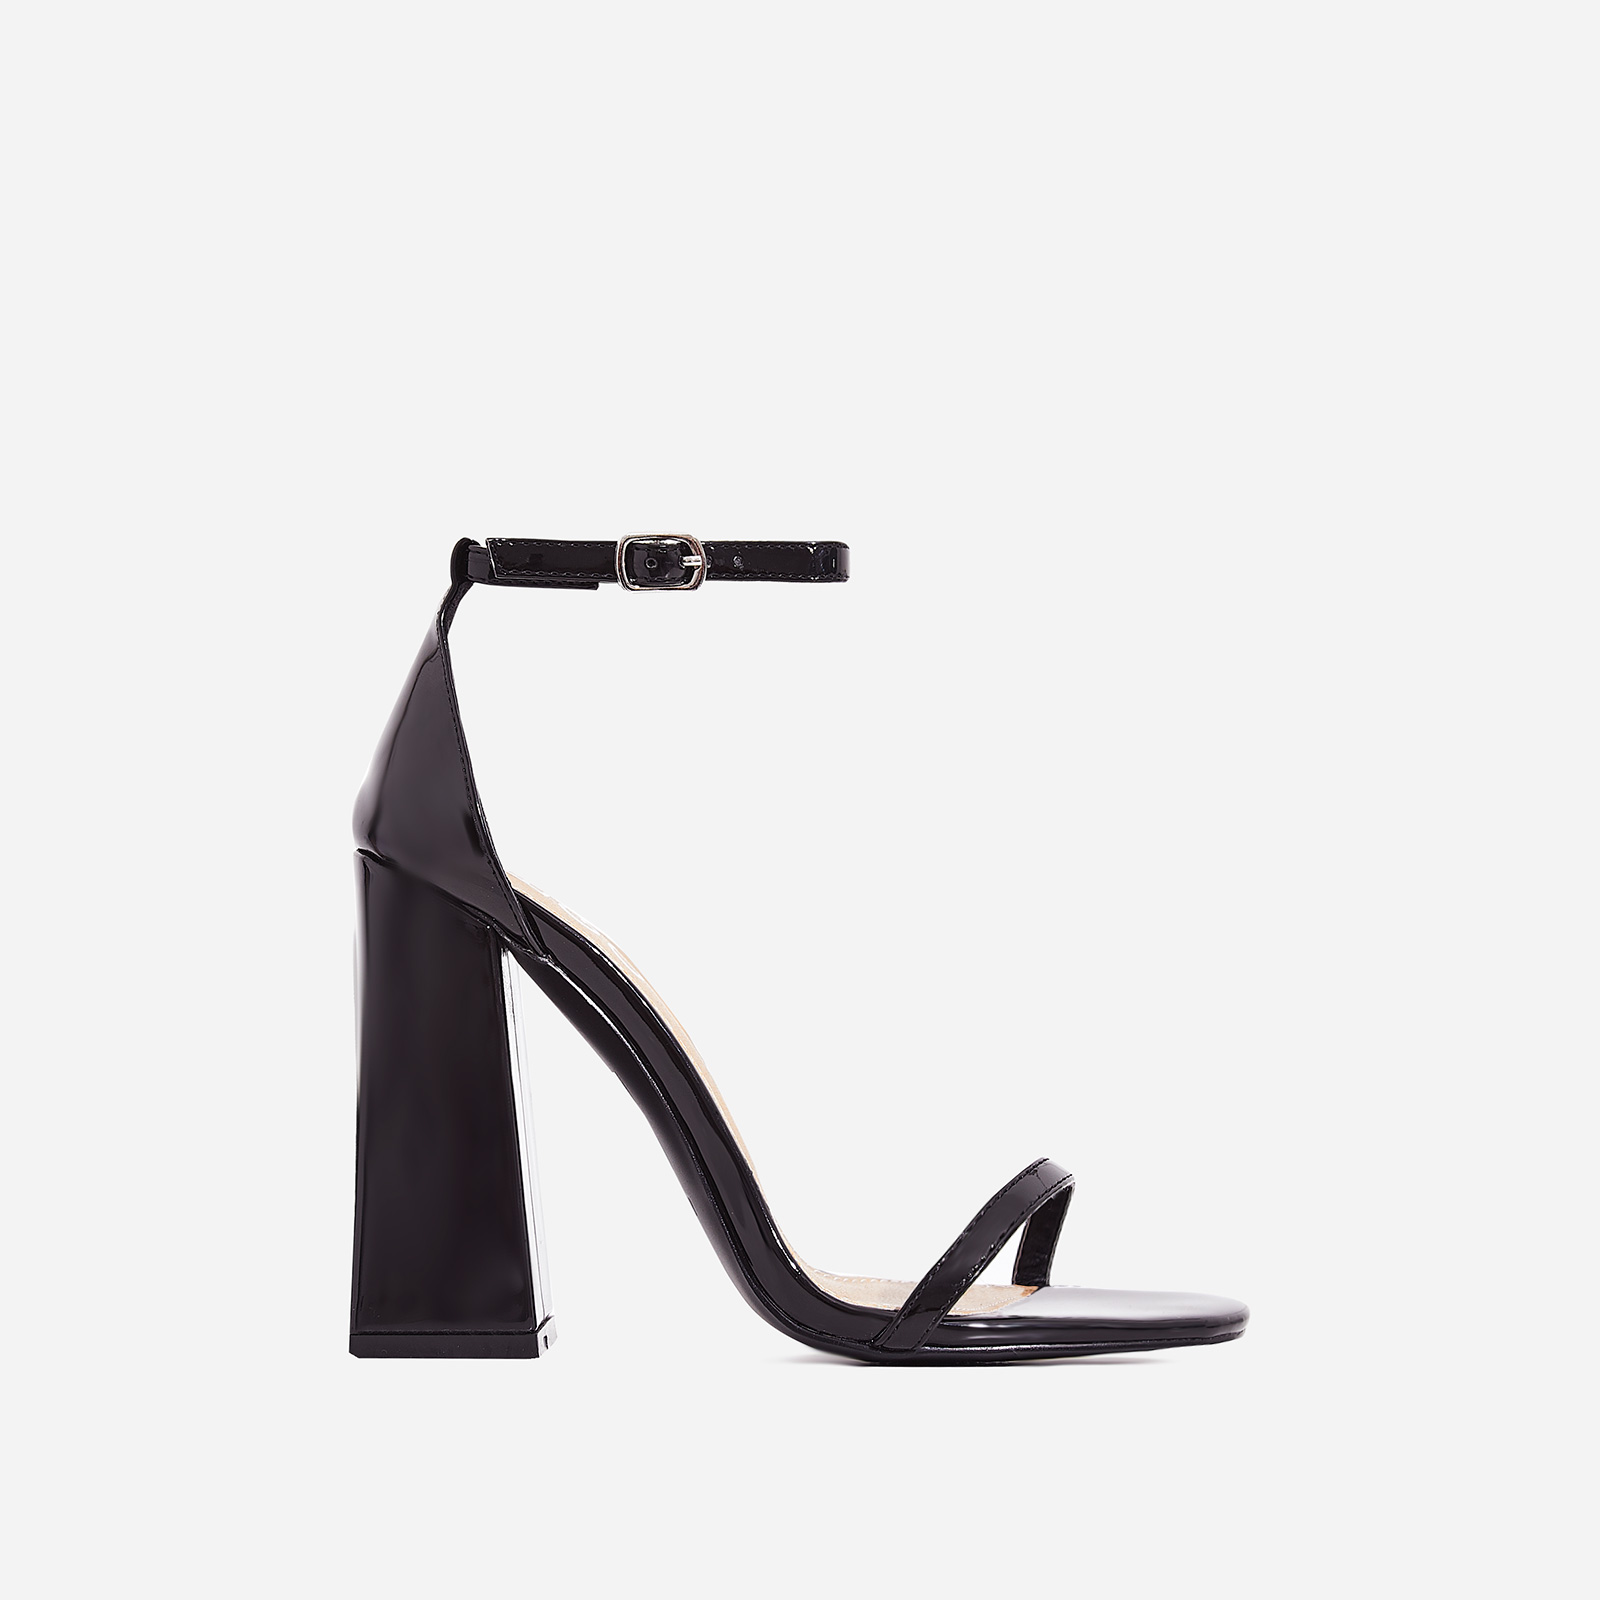 Atomic Square Block Heel  In Black Patent